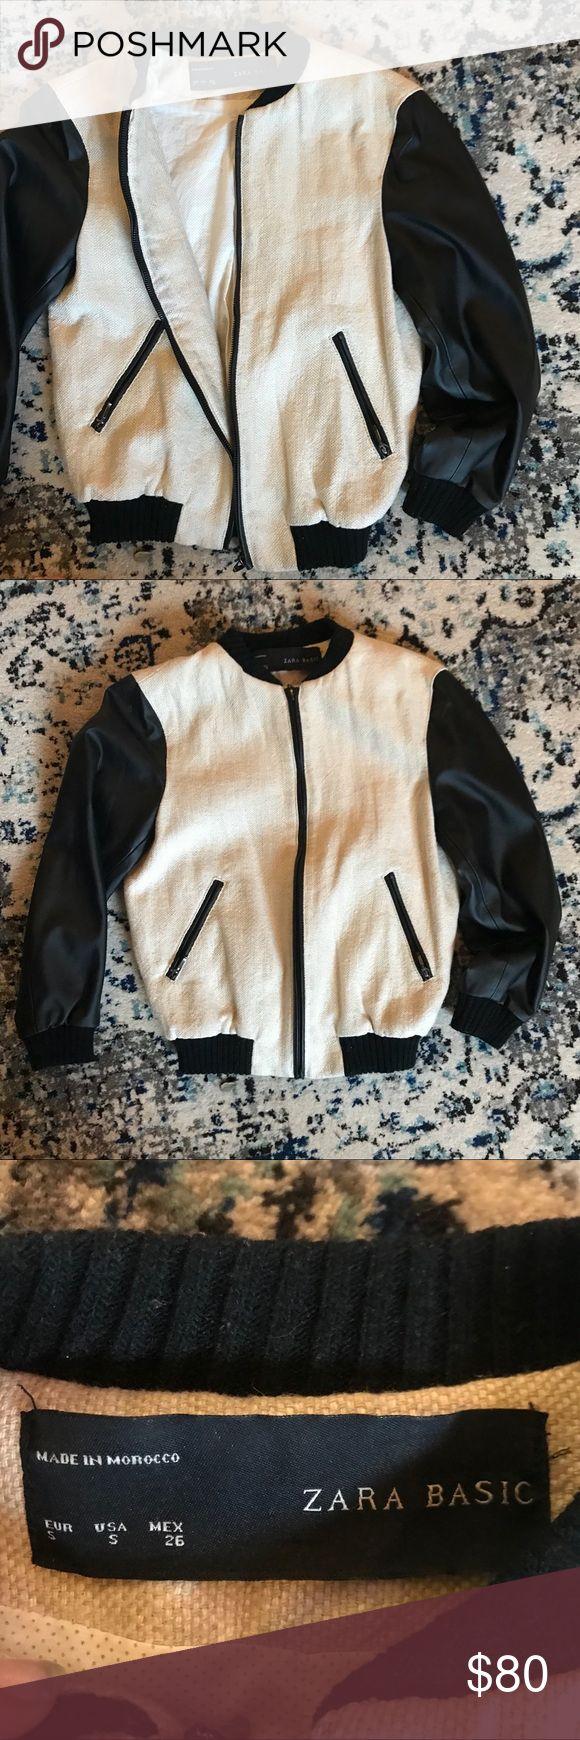 Cropped linen faux leather Zara bomber jacket XS Cropped linen faux leather Zara bomber jacket XS Zara Jackets & Coats Utility Jackets